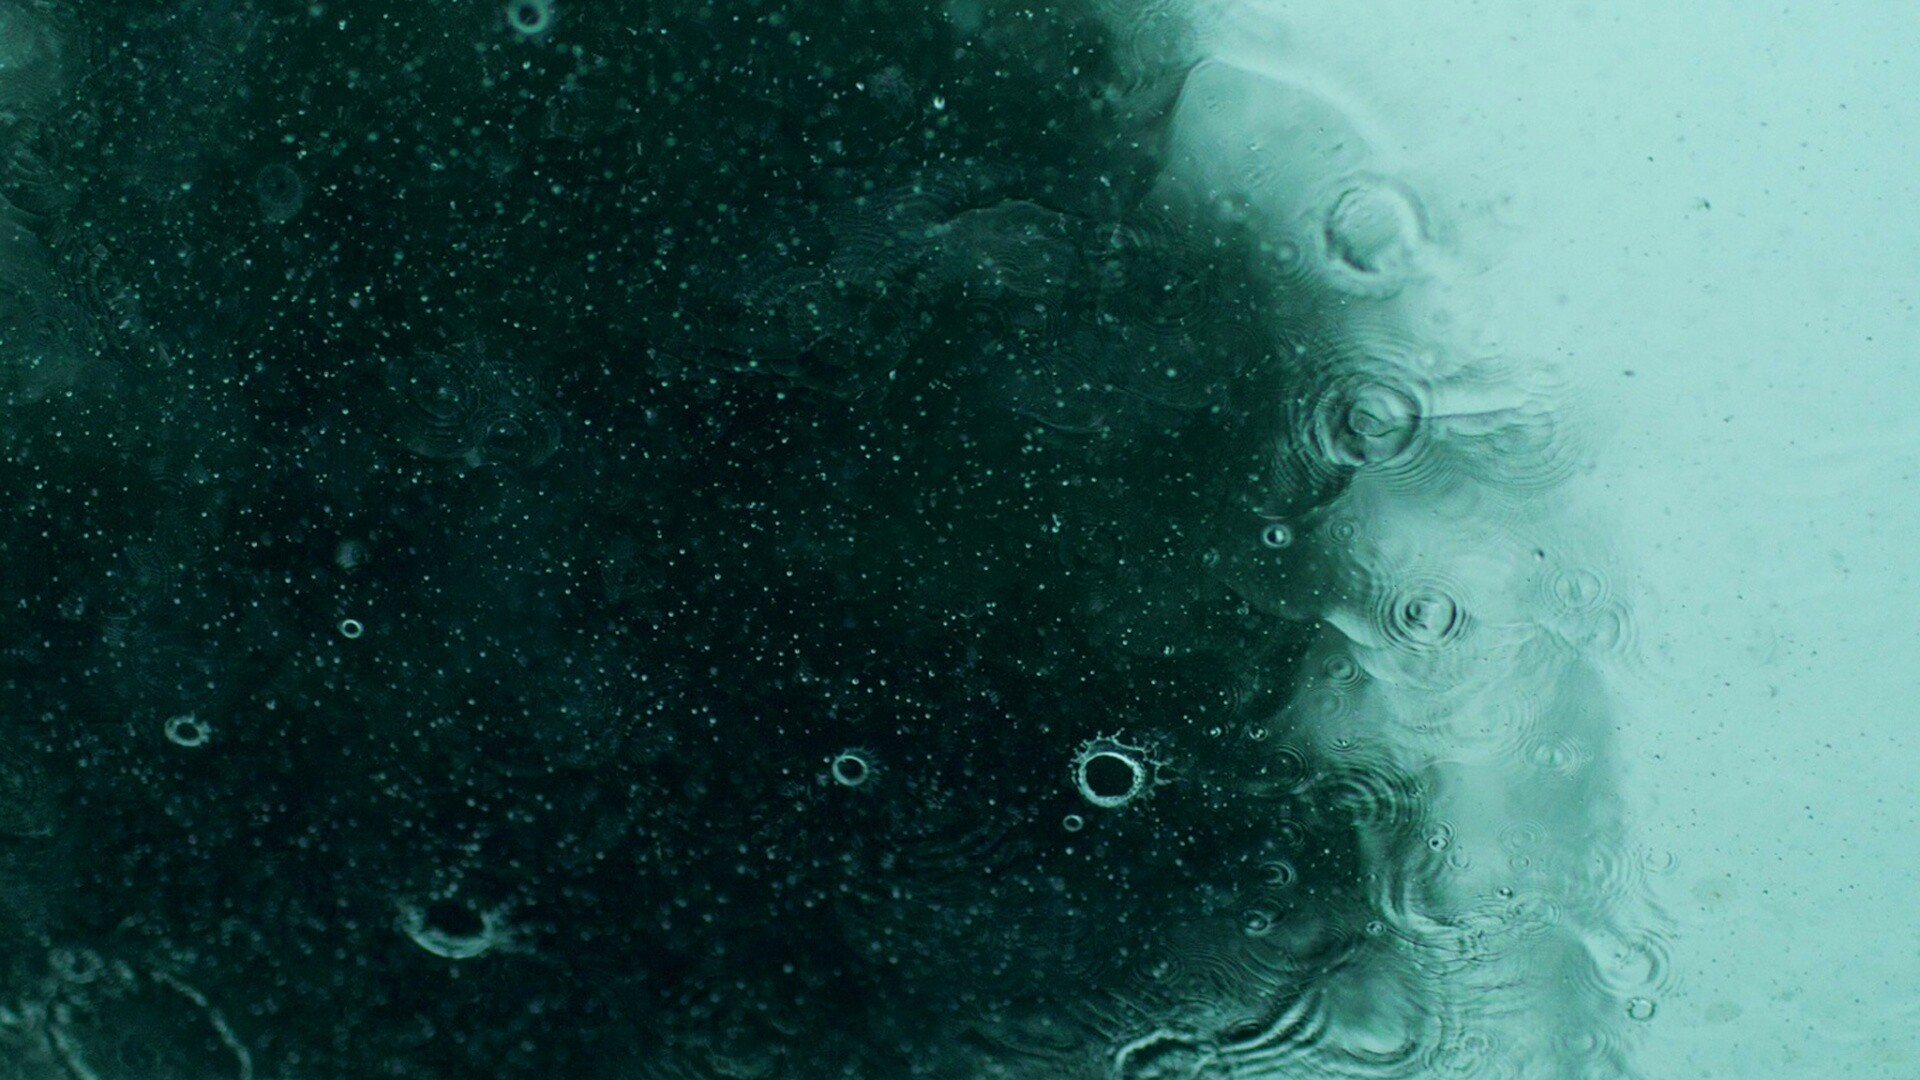 Rain Minimalist Desktop Wallpaper